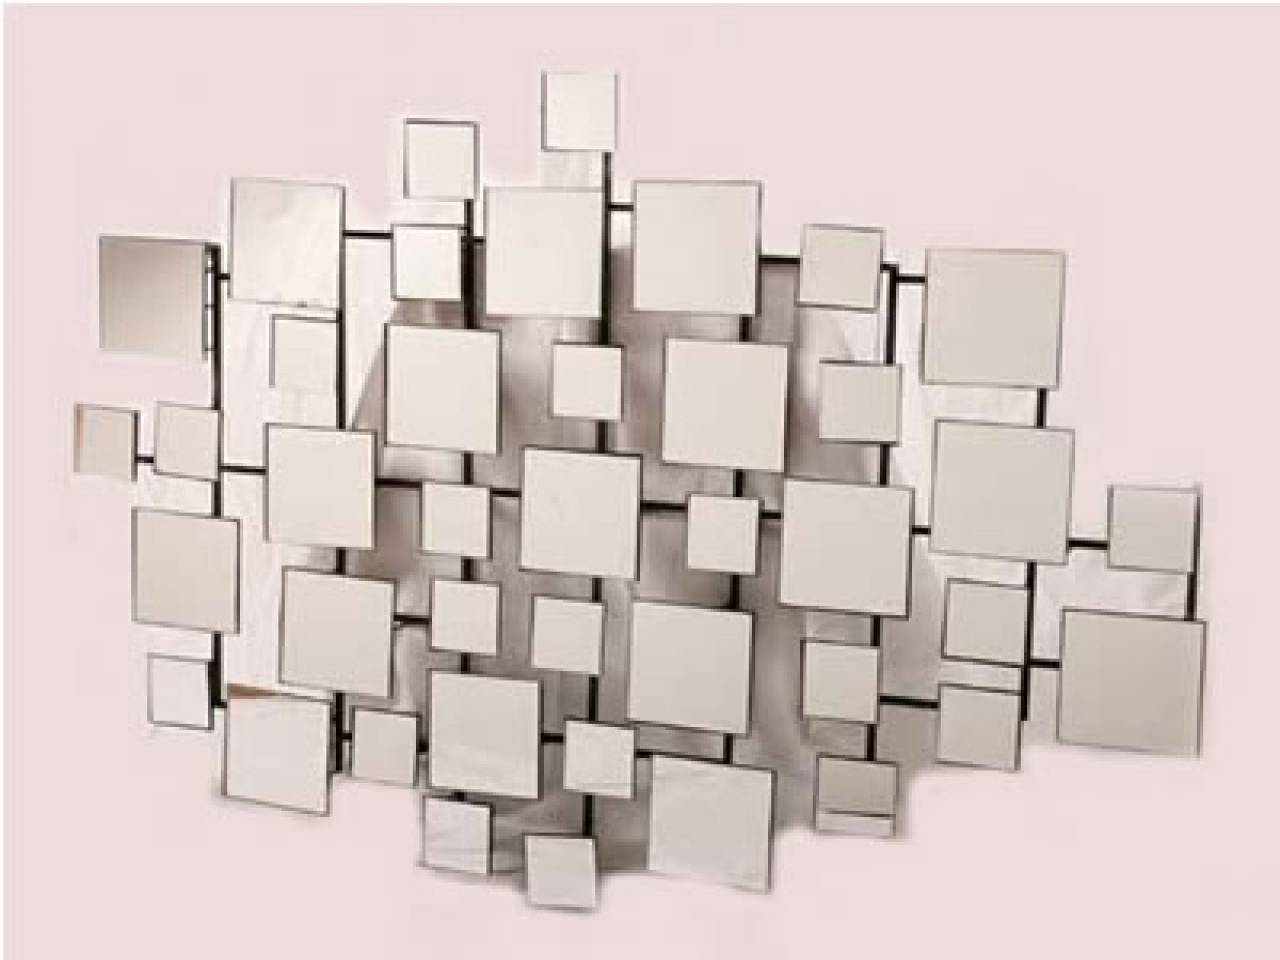 Wall Art Designs: Mirrored Wall Art Geometric Mirror Wall Art For 2017 Metal Wall Art With Mirrors (View 16 of 20)